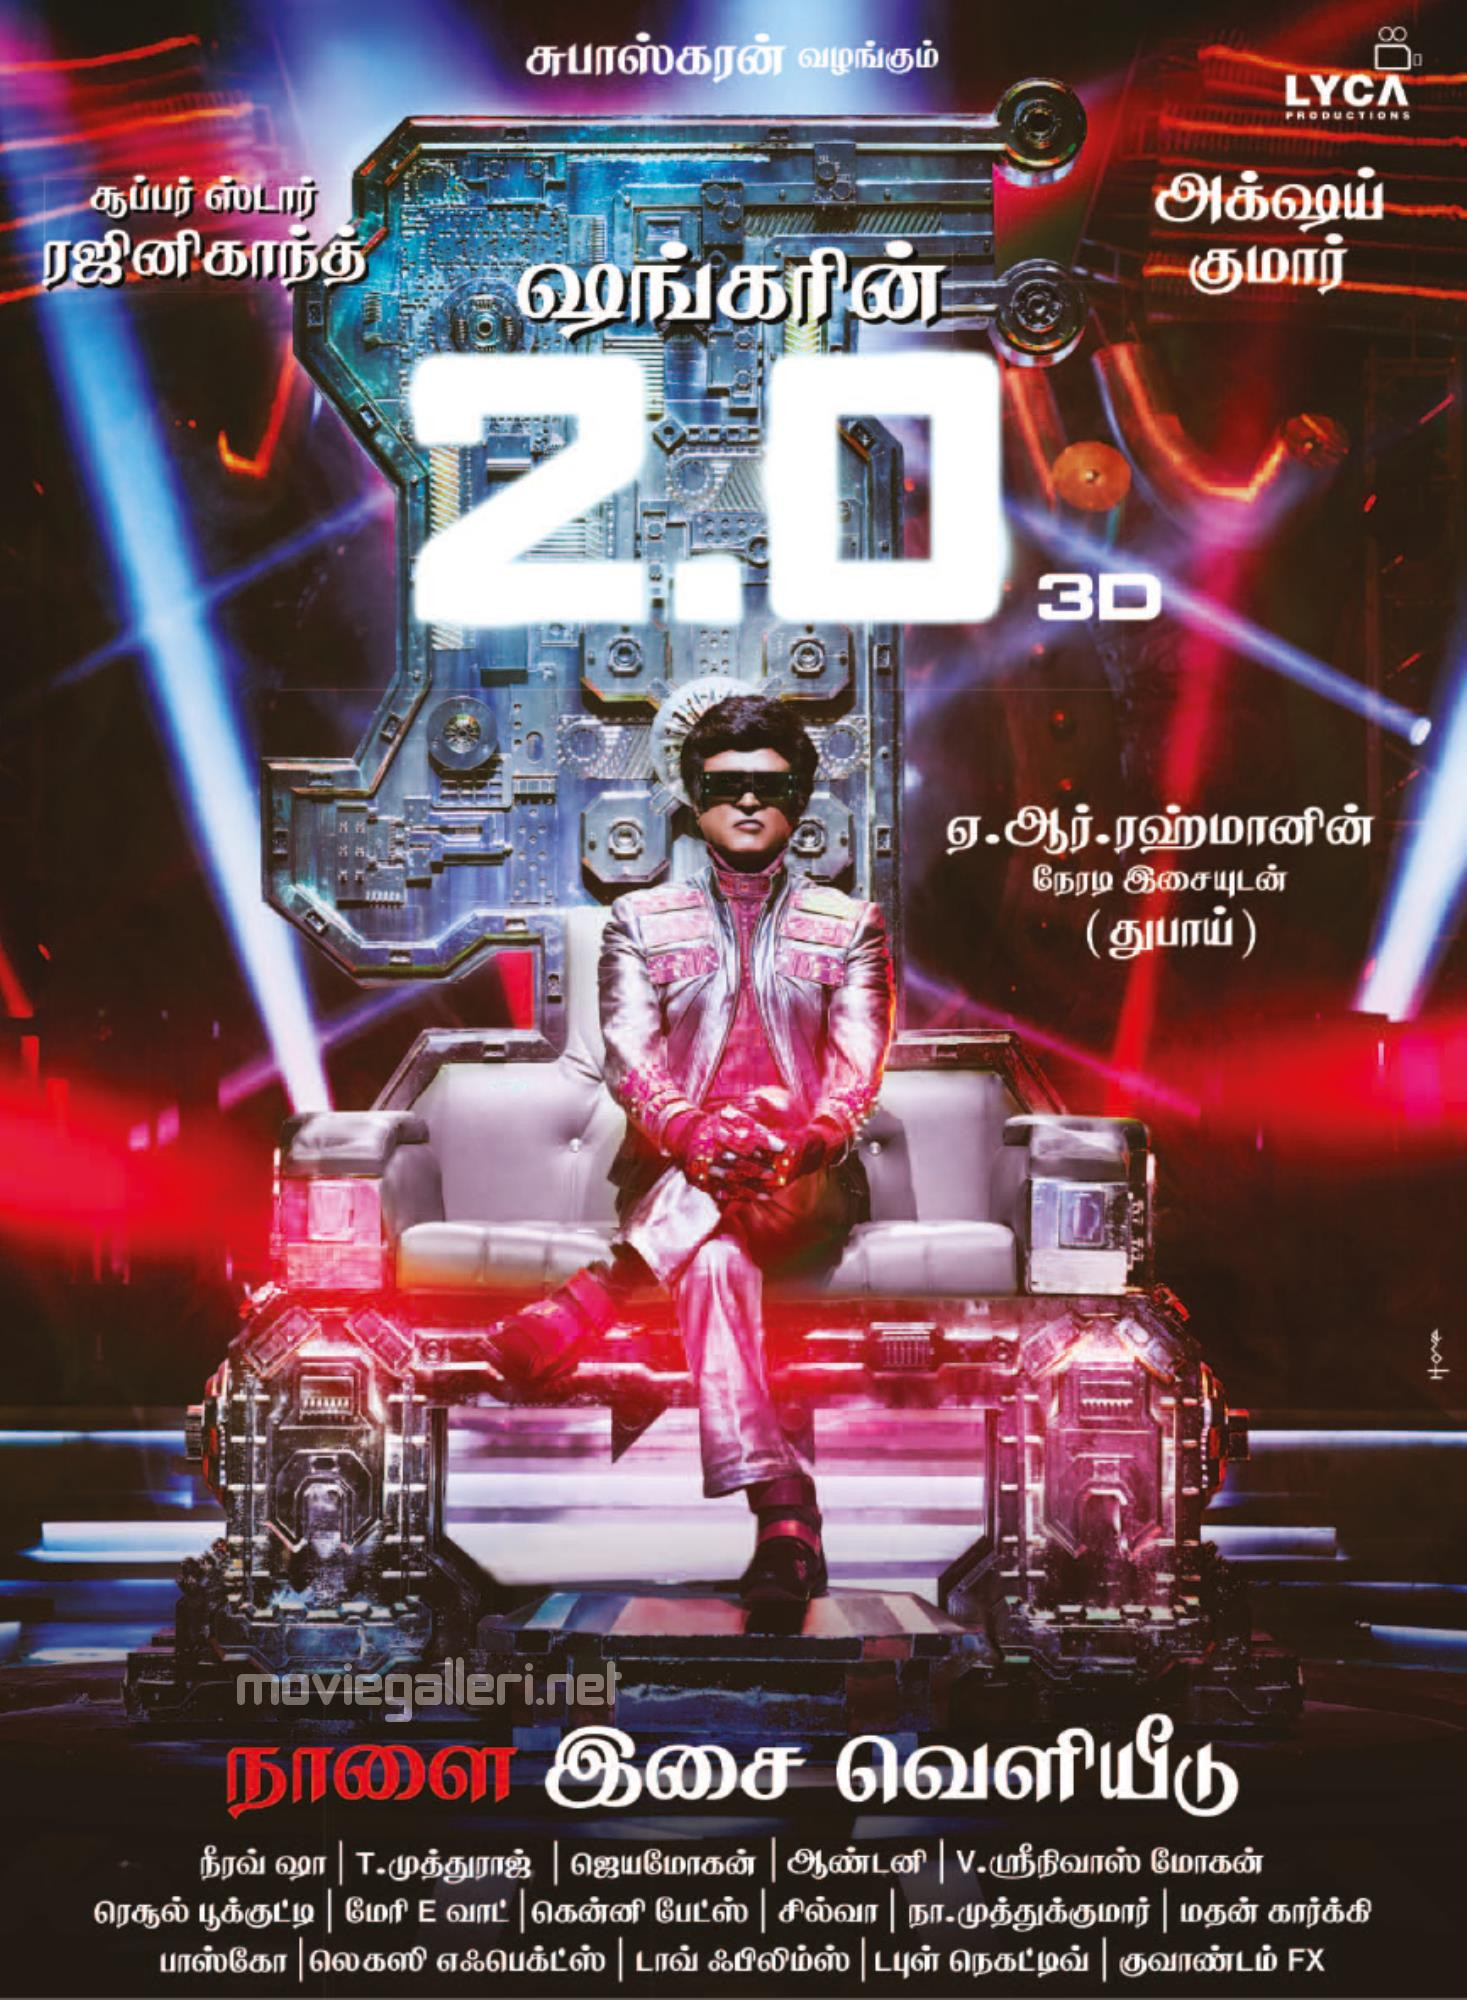 Rajinikanth 2point0 Audio Launch Tomorrow Poster